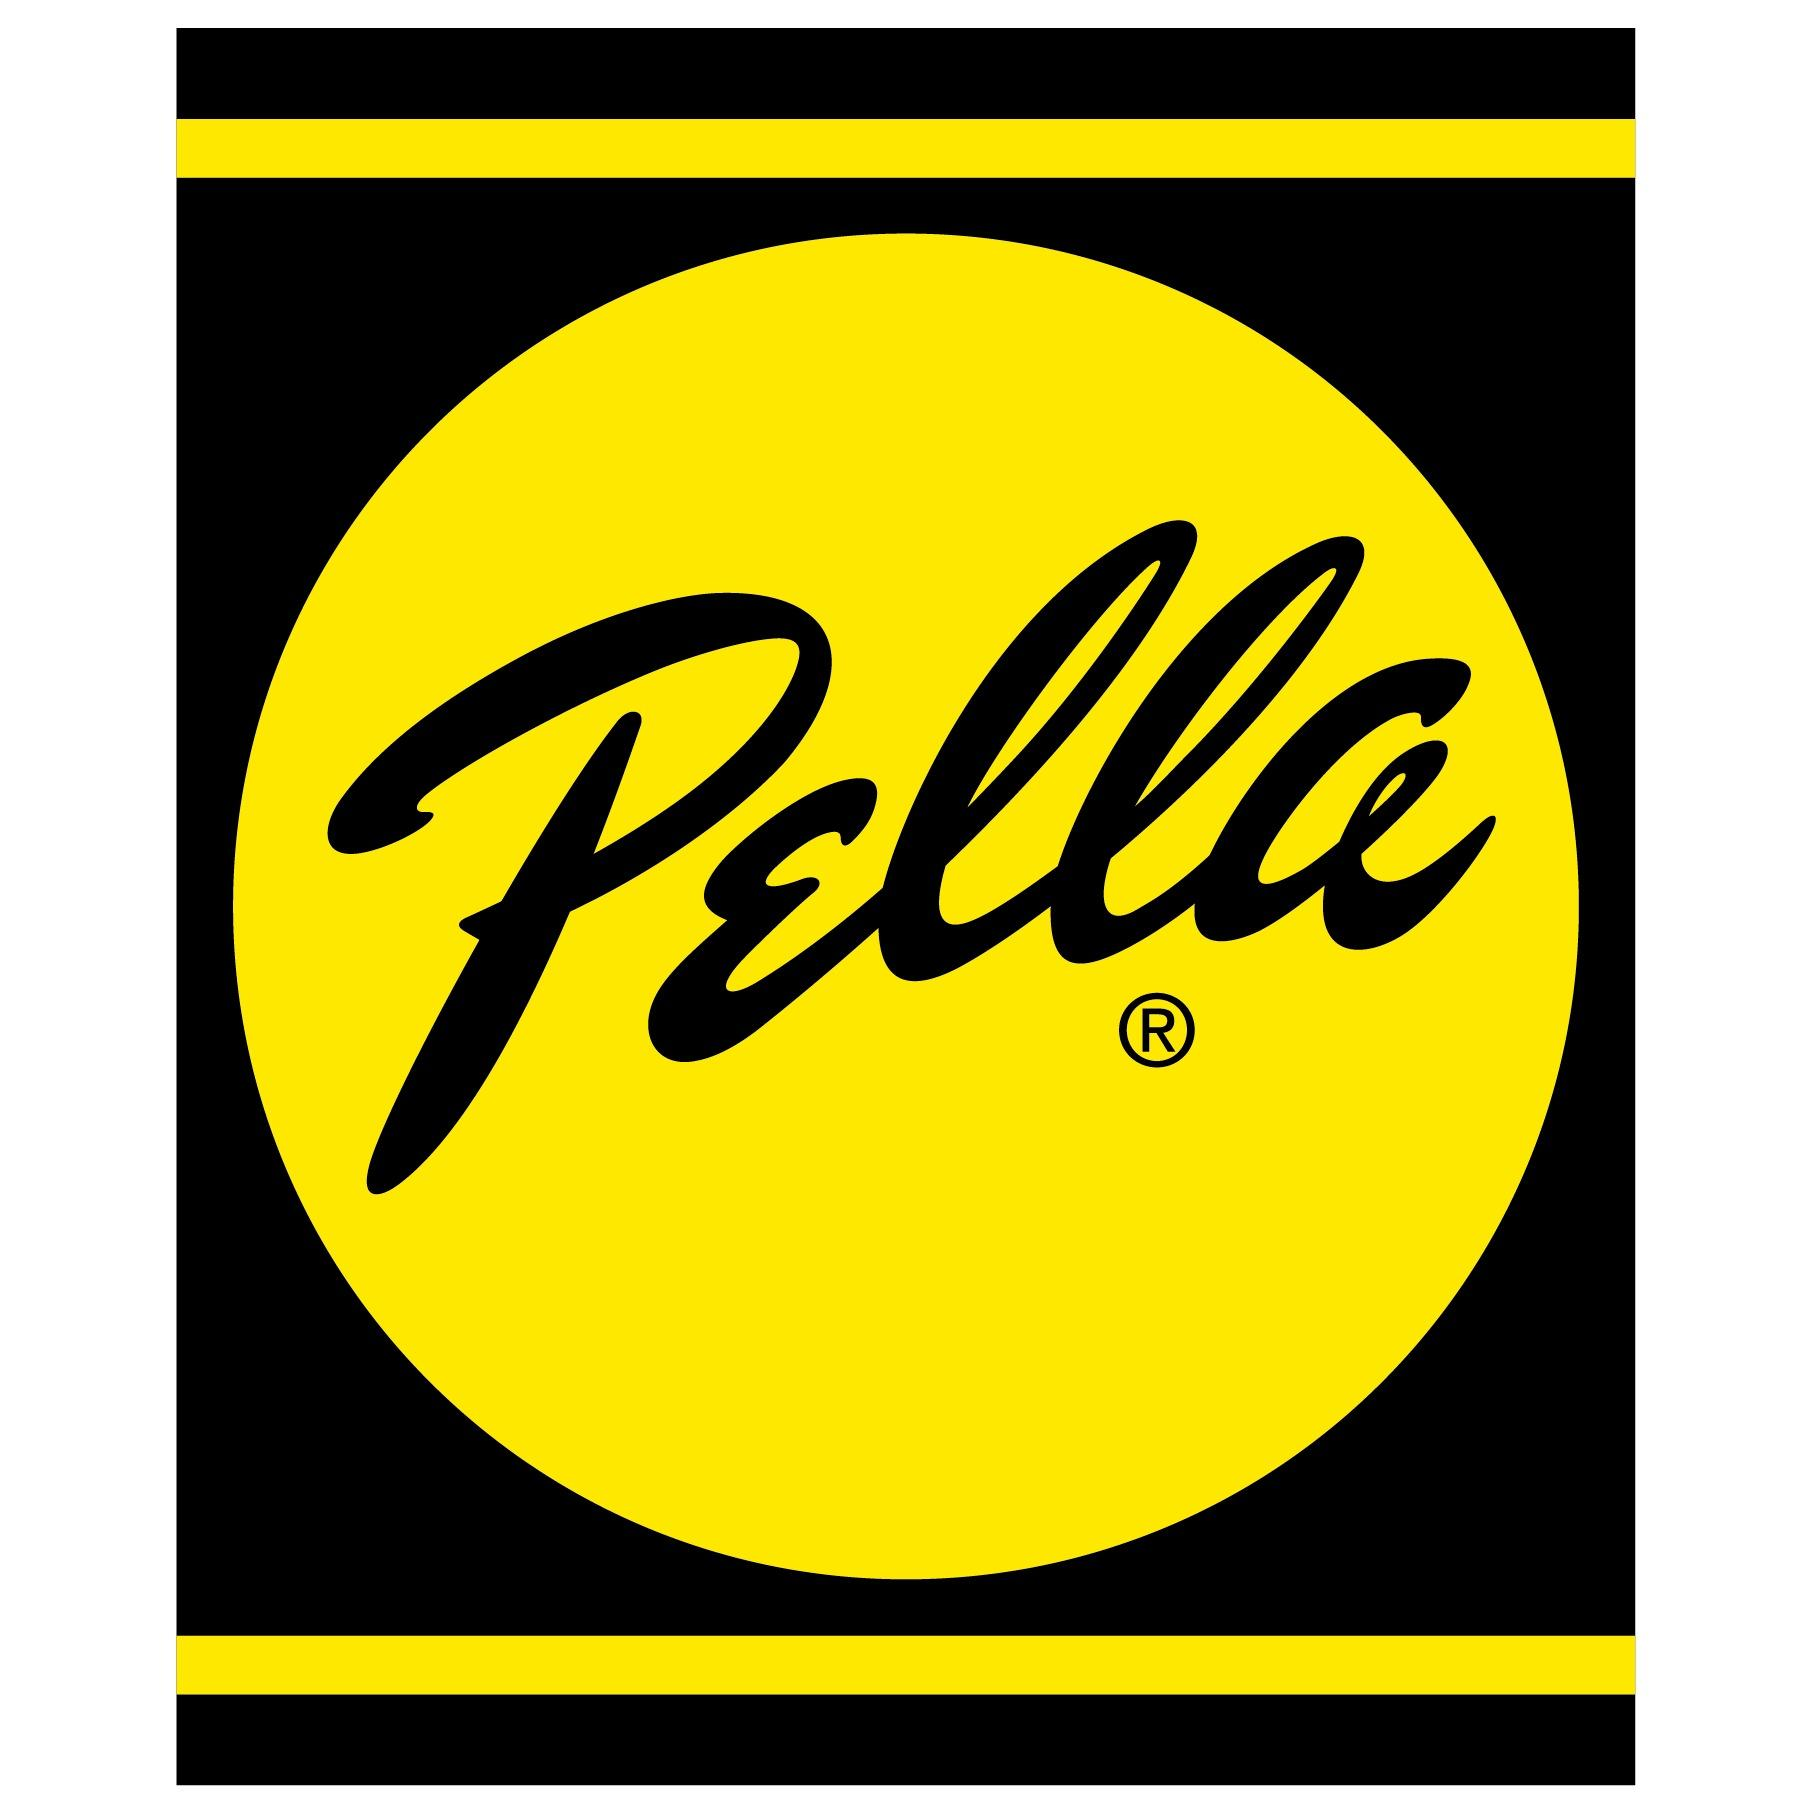 Pella Windows and Doors of Westerly